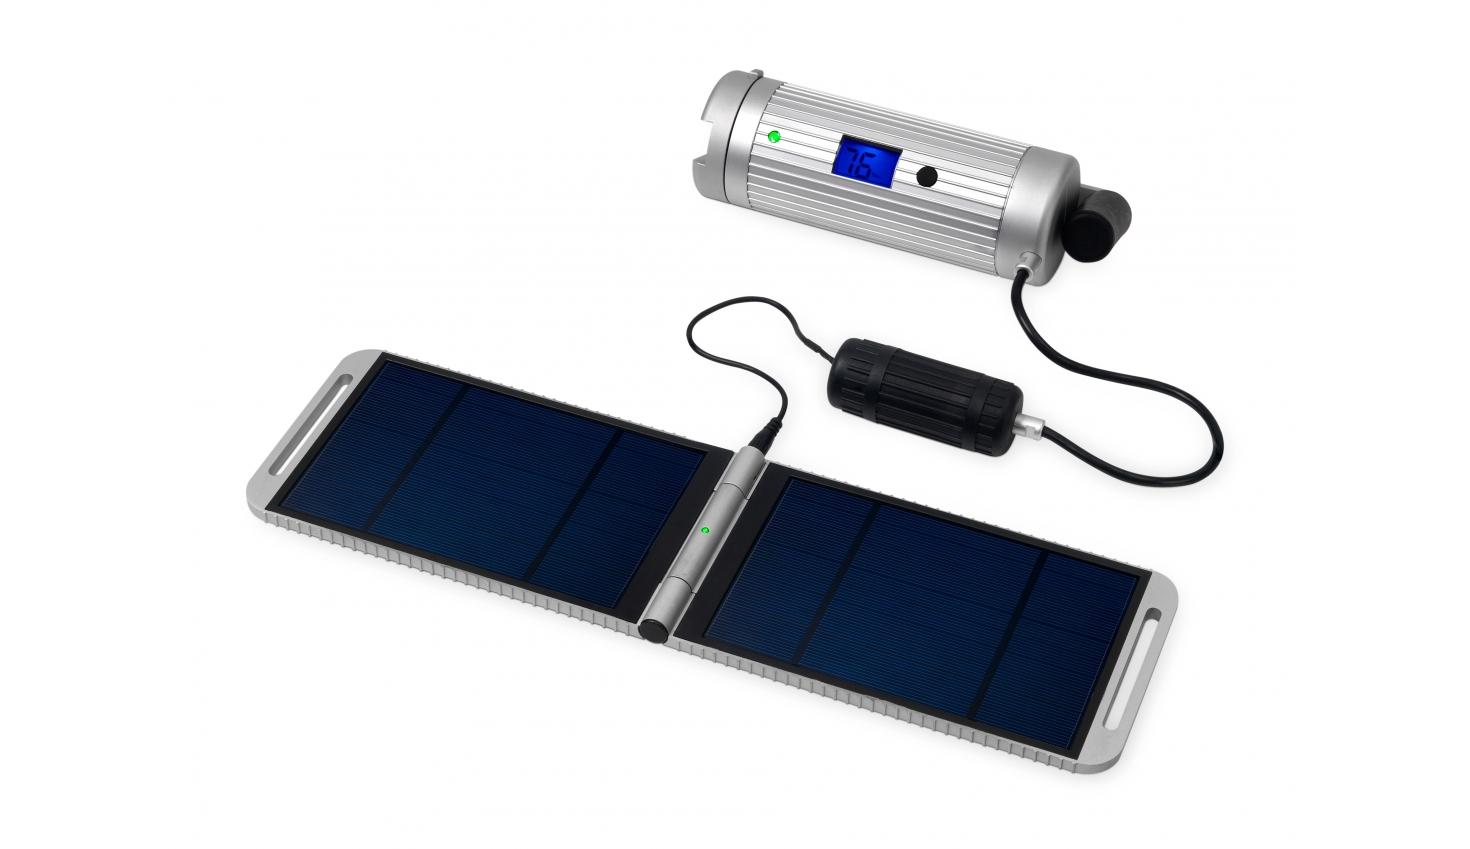 Solarmonkey Expedition USB-Solarlmodul im Alu-Design